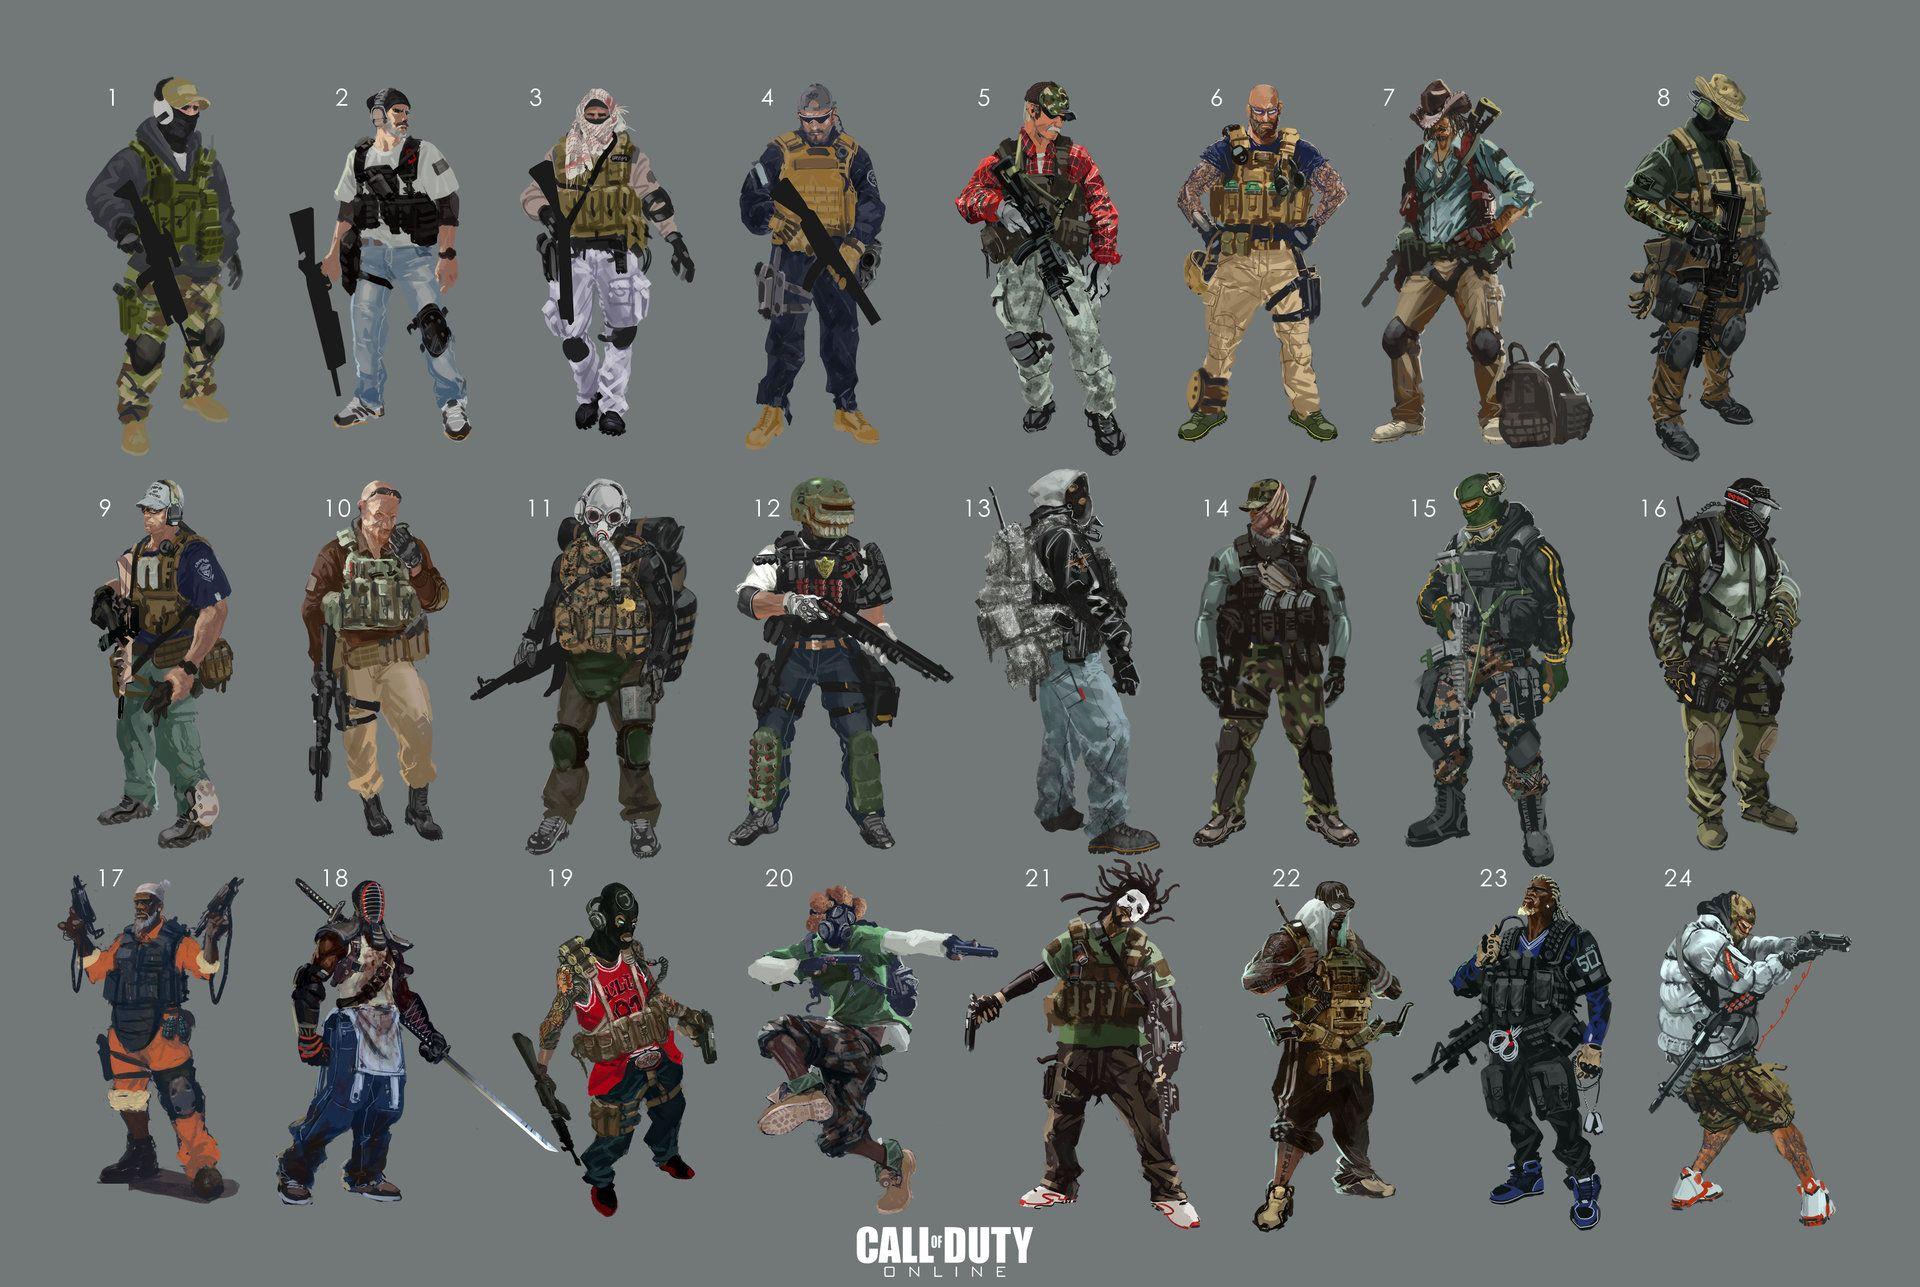 ArtStation - call of duty Online-mercenaries concept, Jay Li